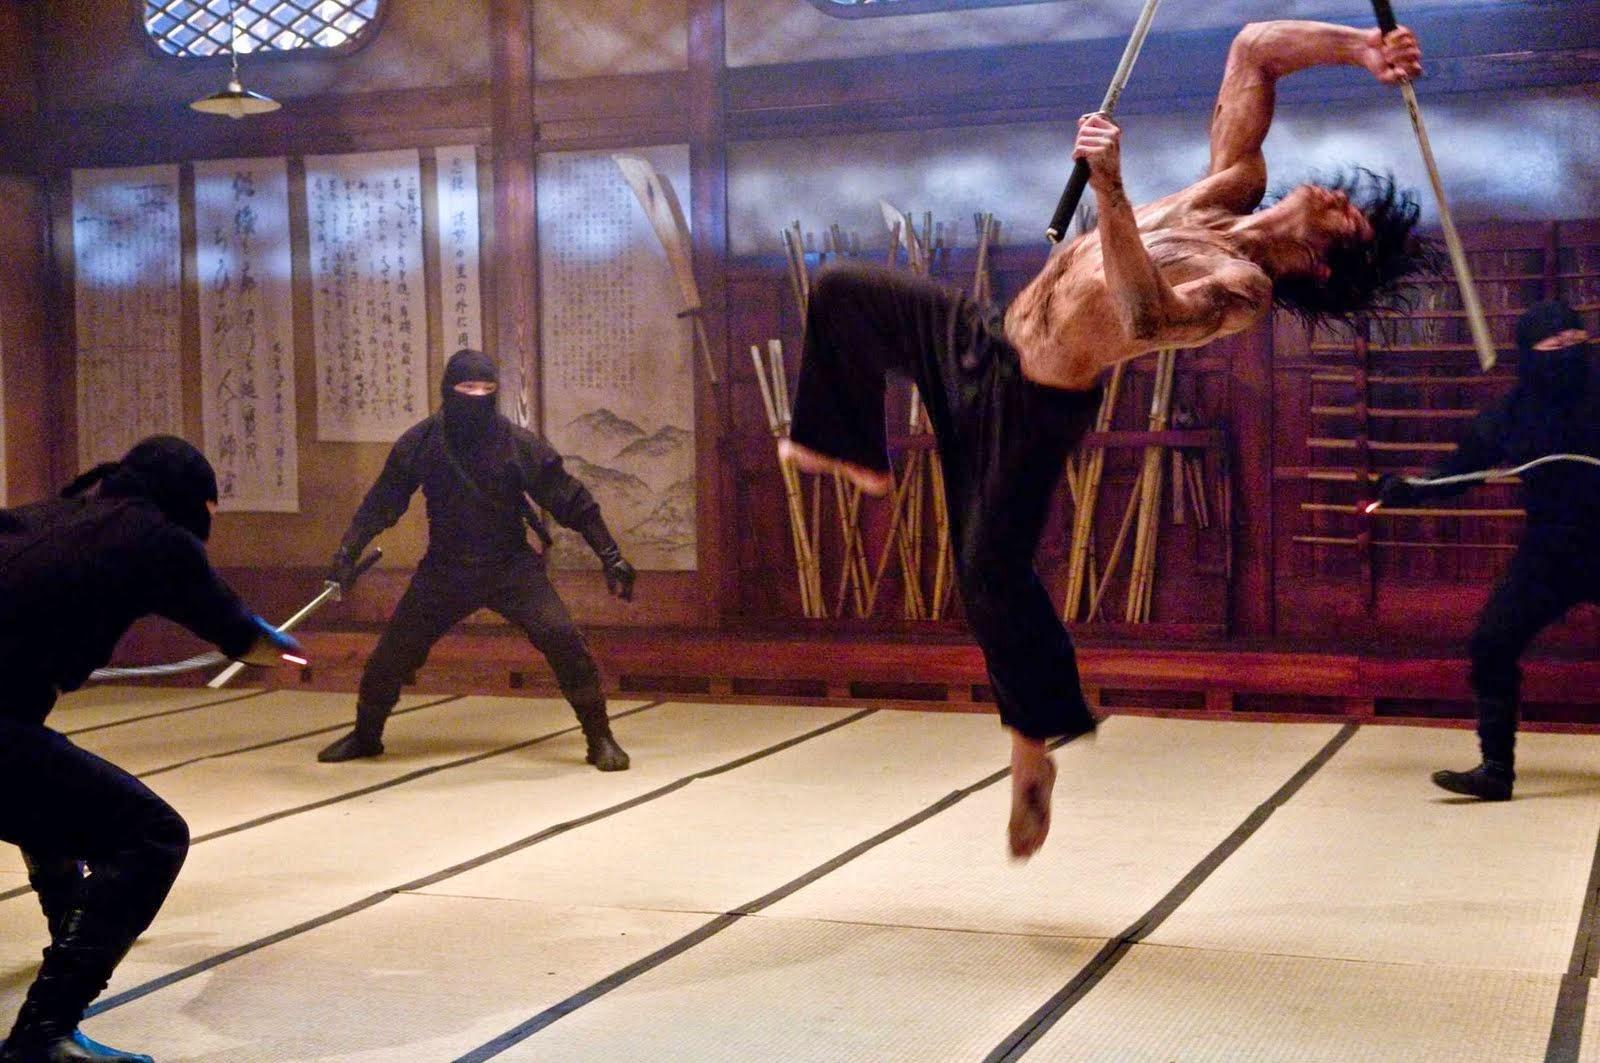 Ảnh trong phim Ninja Sát Thủ - Ninja Assassin 2